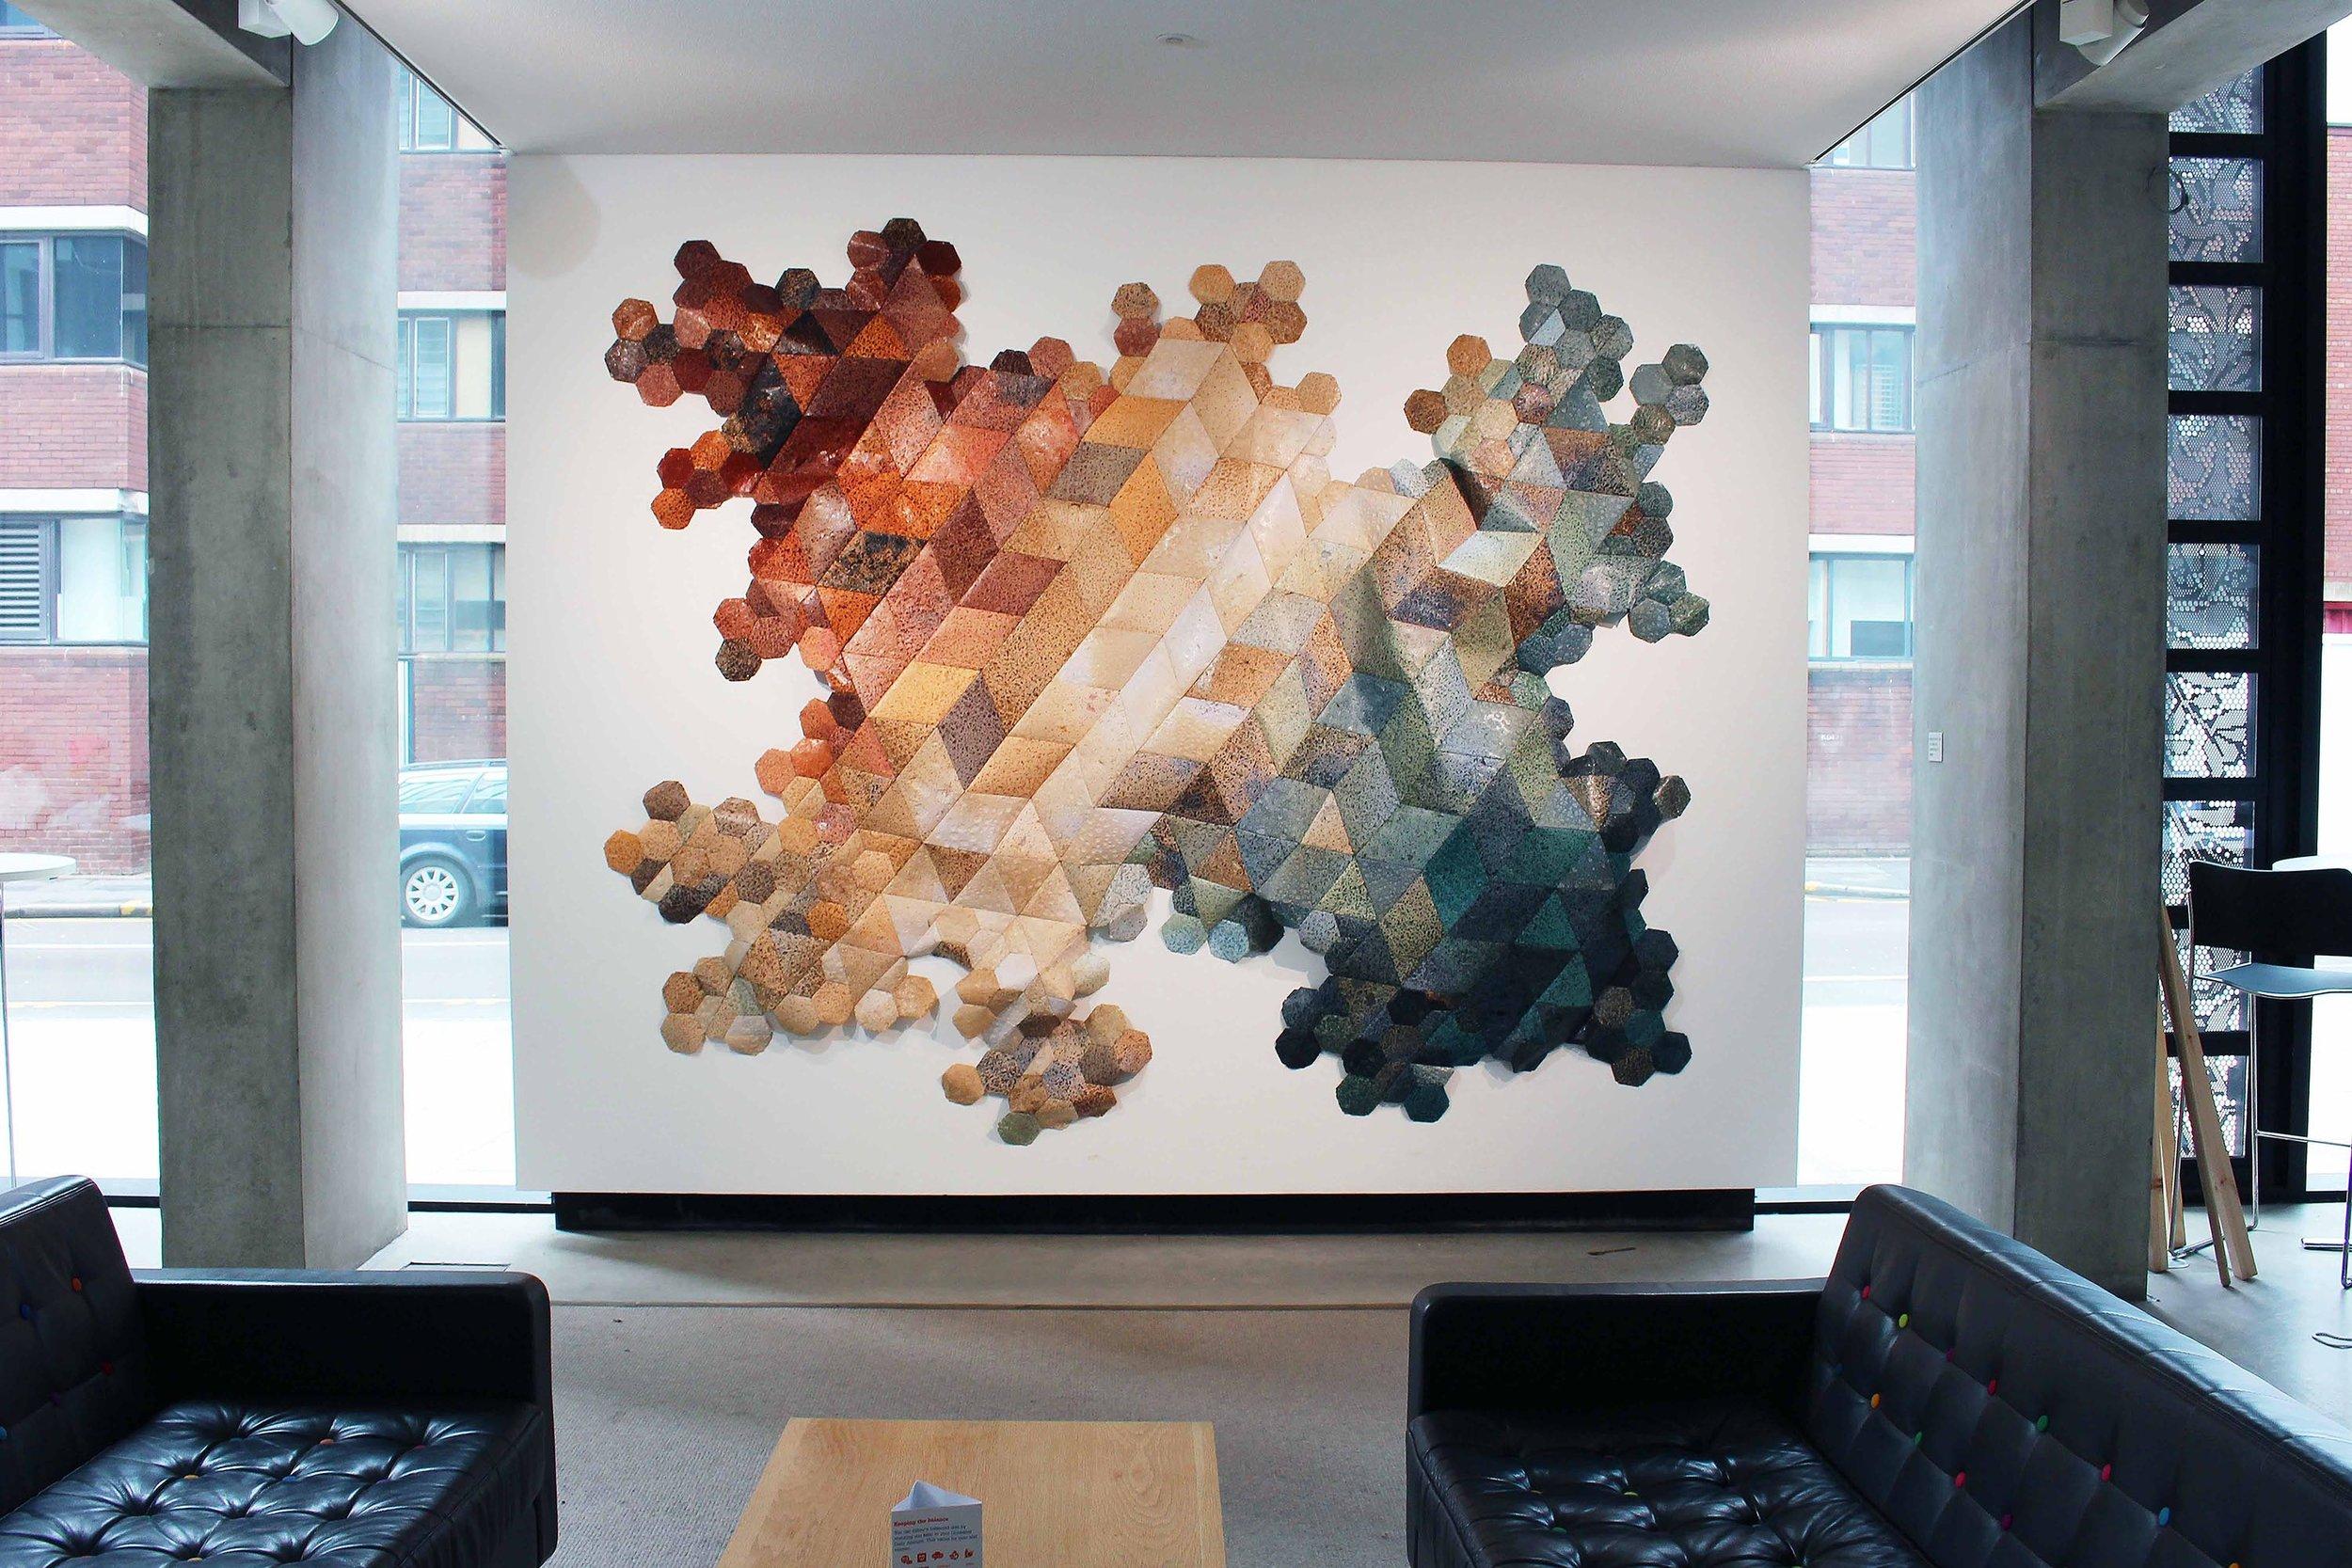 Hannah Elisabeth Jones - Commission for Vertical Gallery, Manchester School of Art, 2017